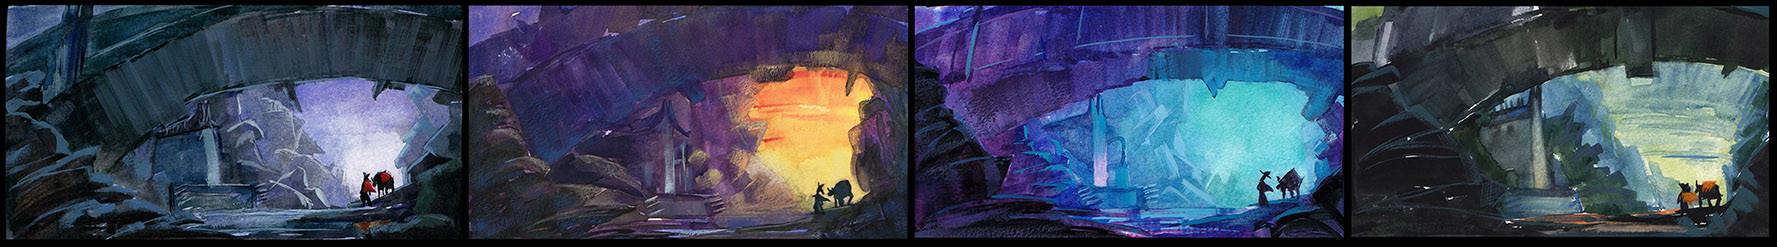 24s and color stsadasdasdudy.jpg